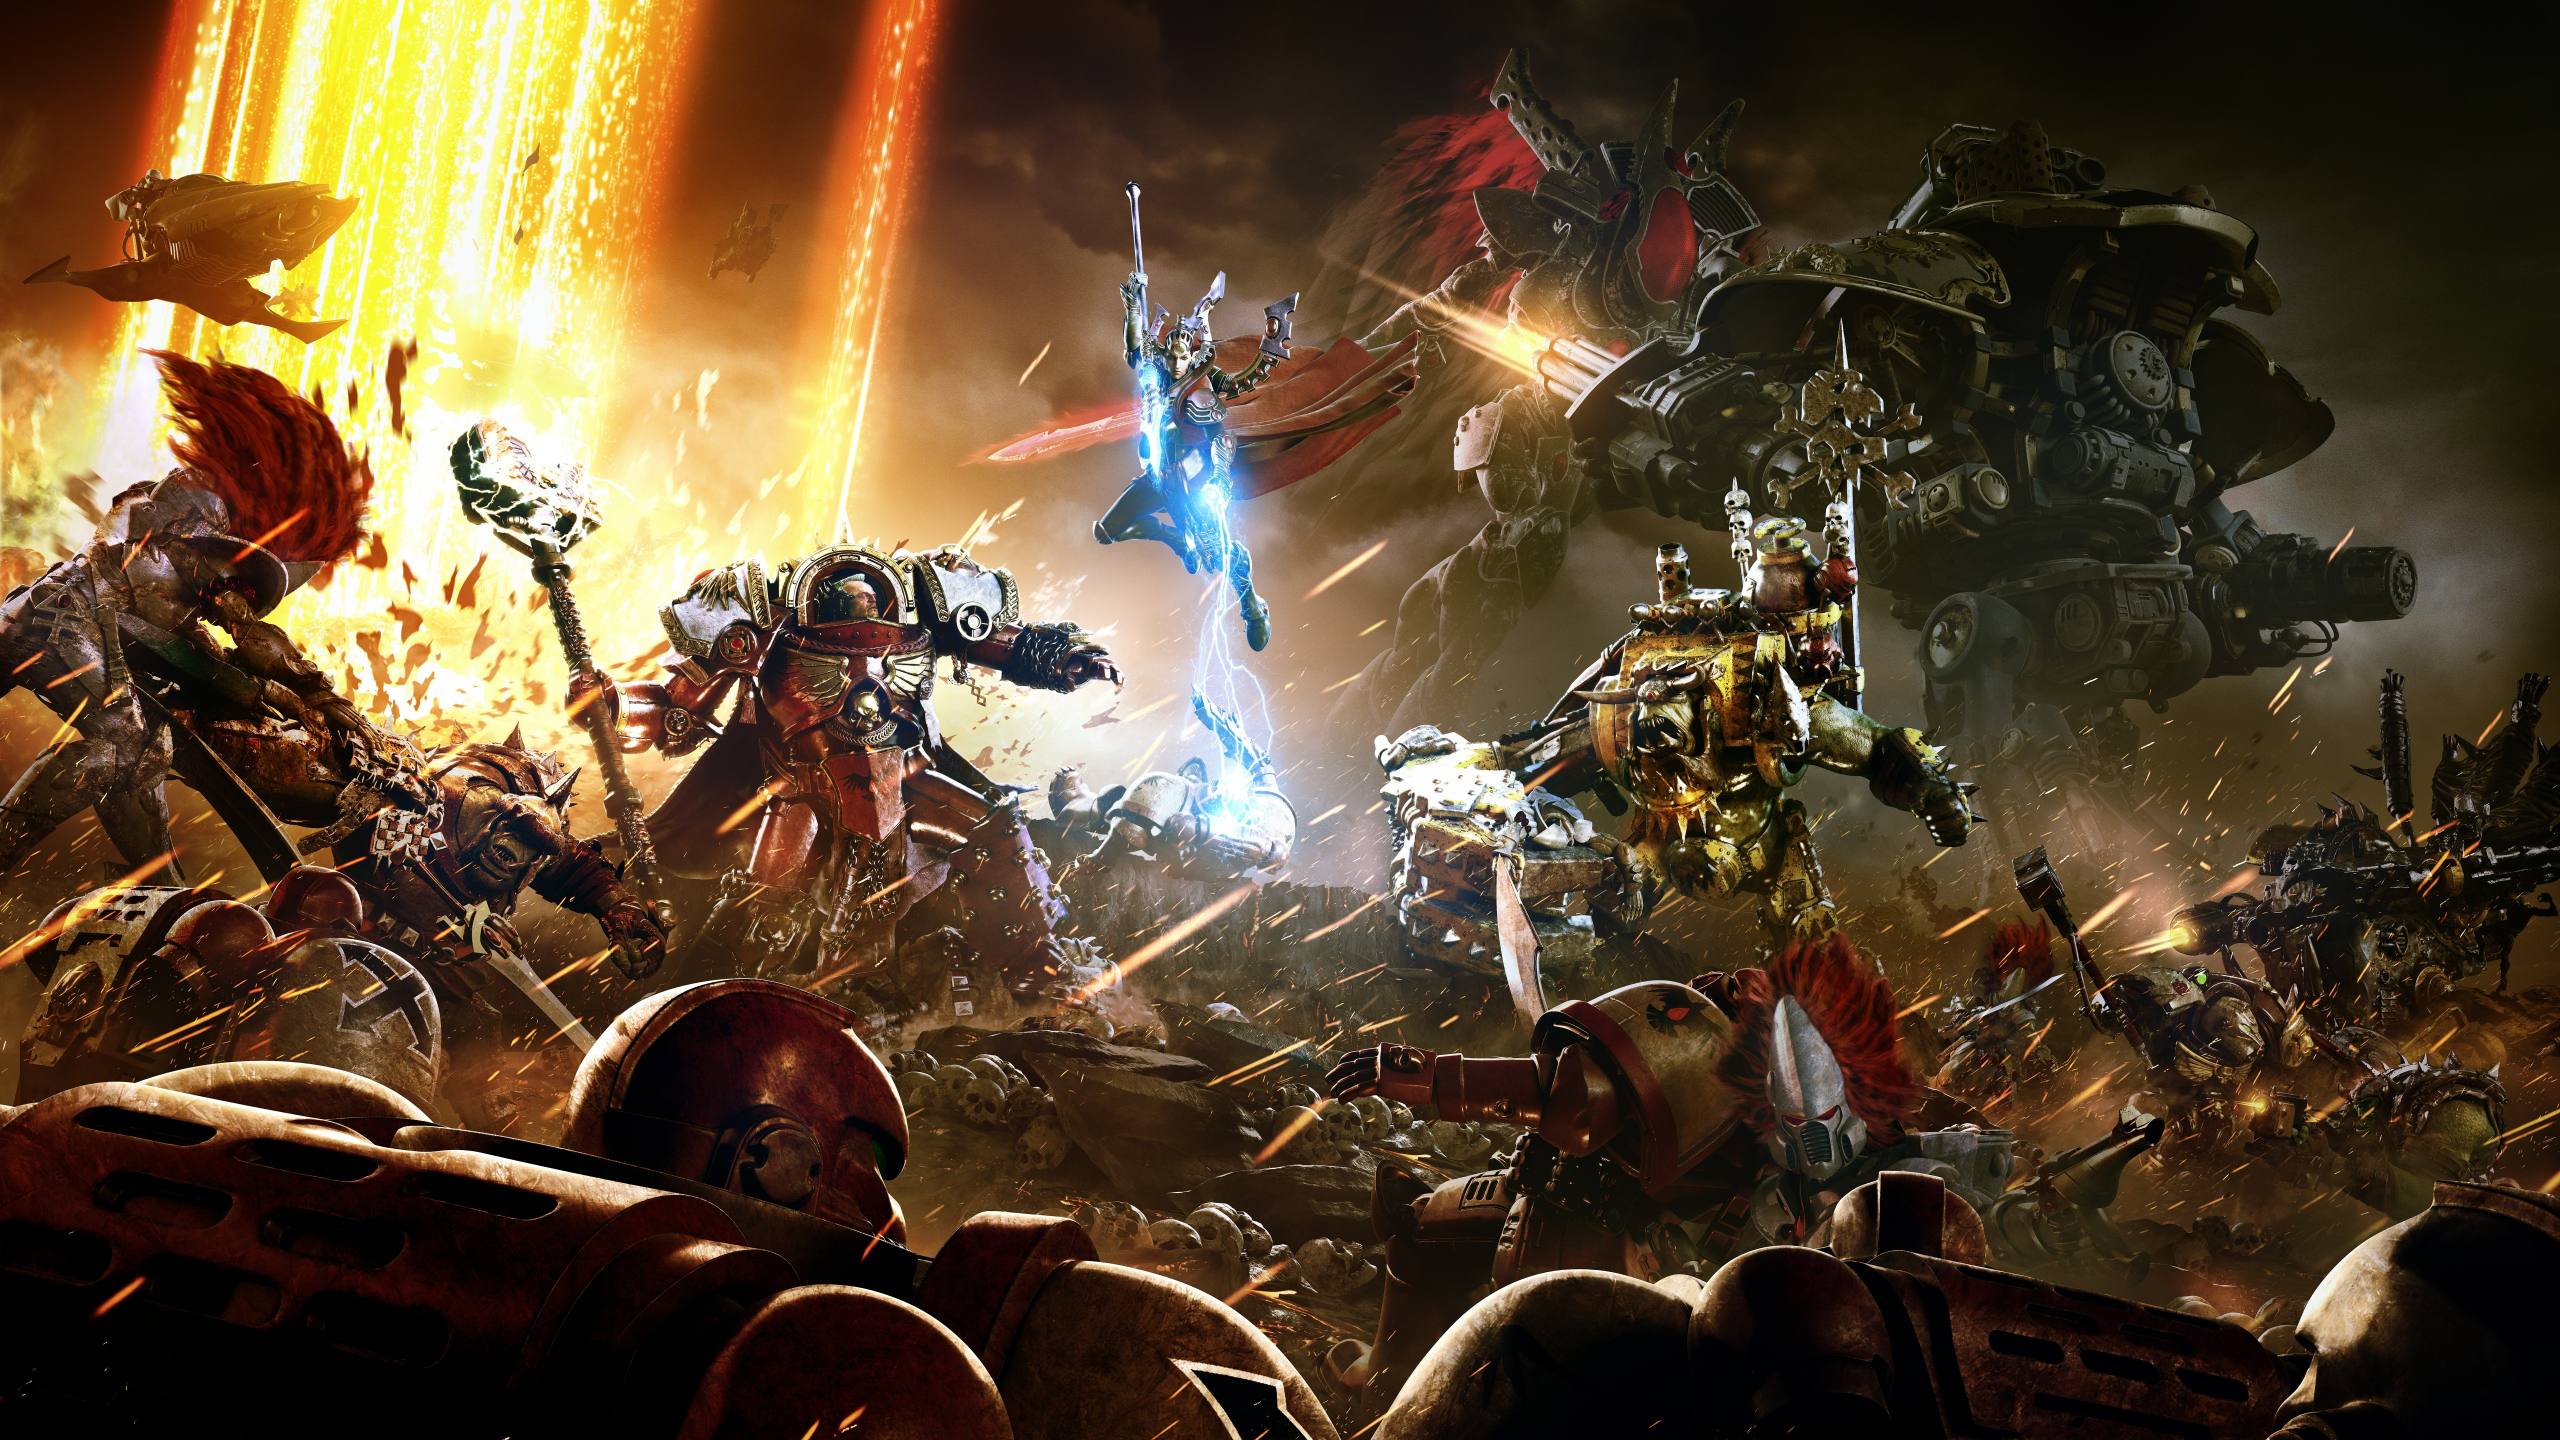 Download 2560x1440 Wallpaper Warhammer 40 000 Space Marine Video Game Art Dual Wide Widescreen 16 9 Widescreen 2560x1440 Hd Image Background 17000